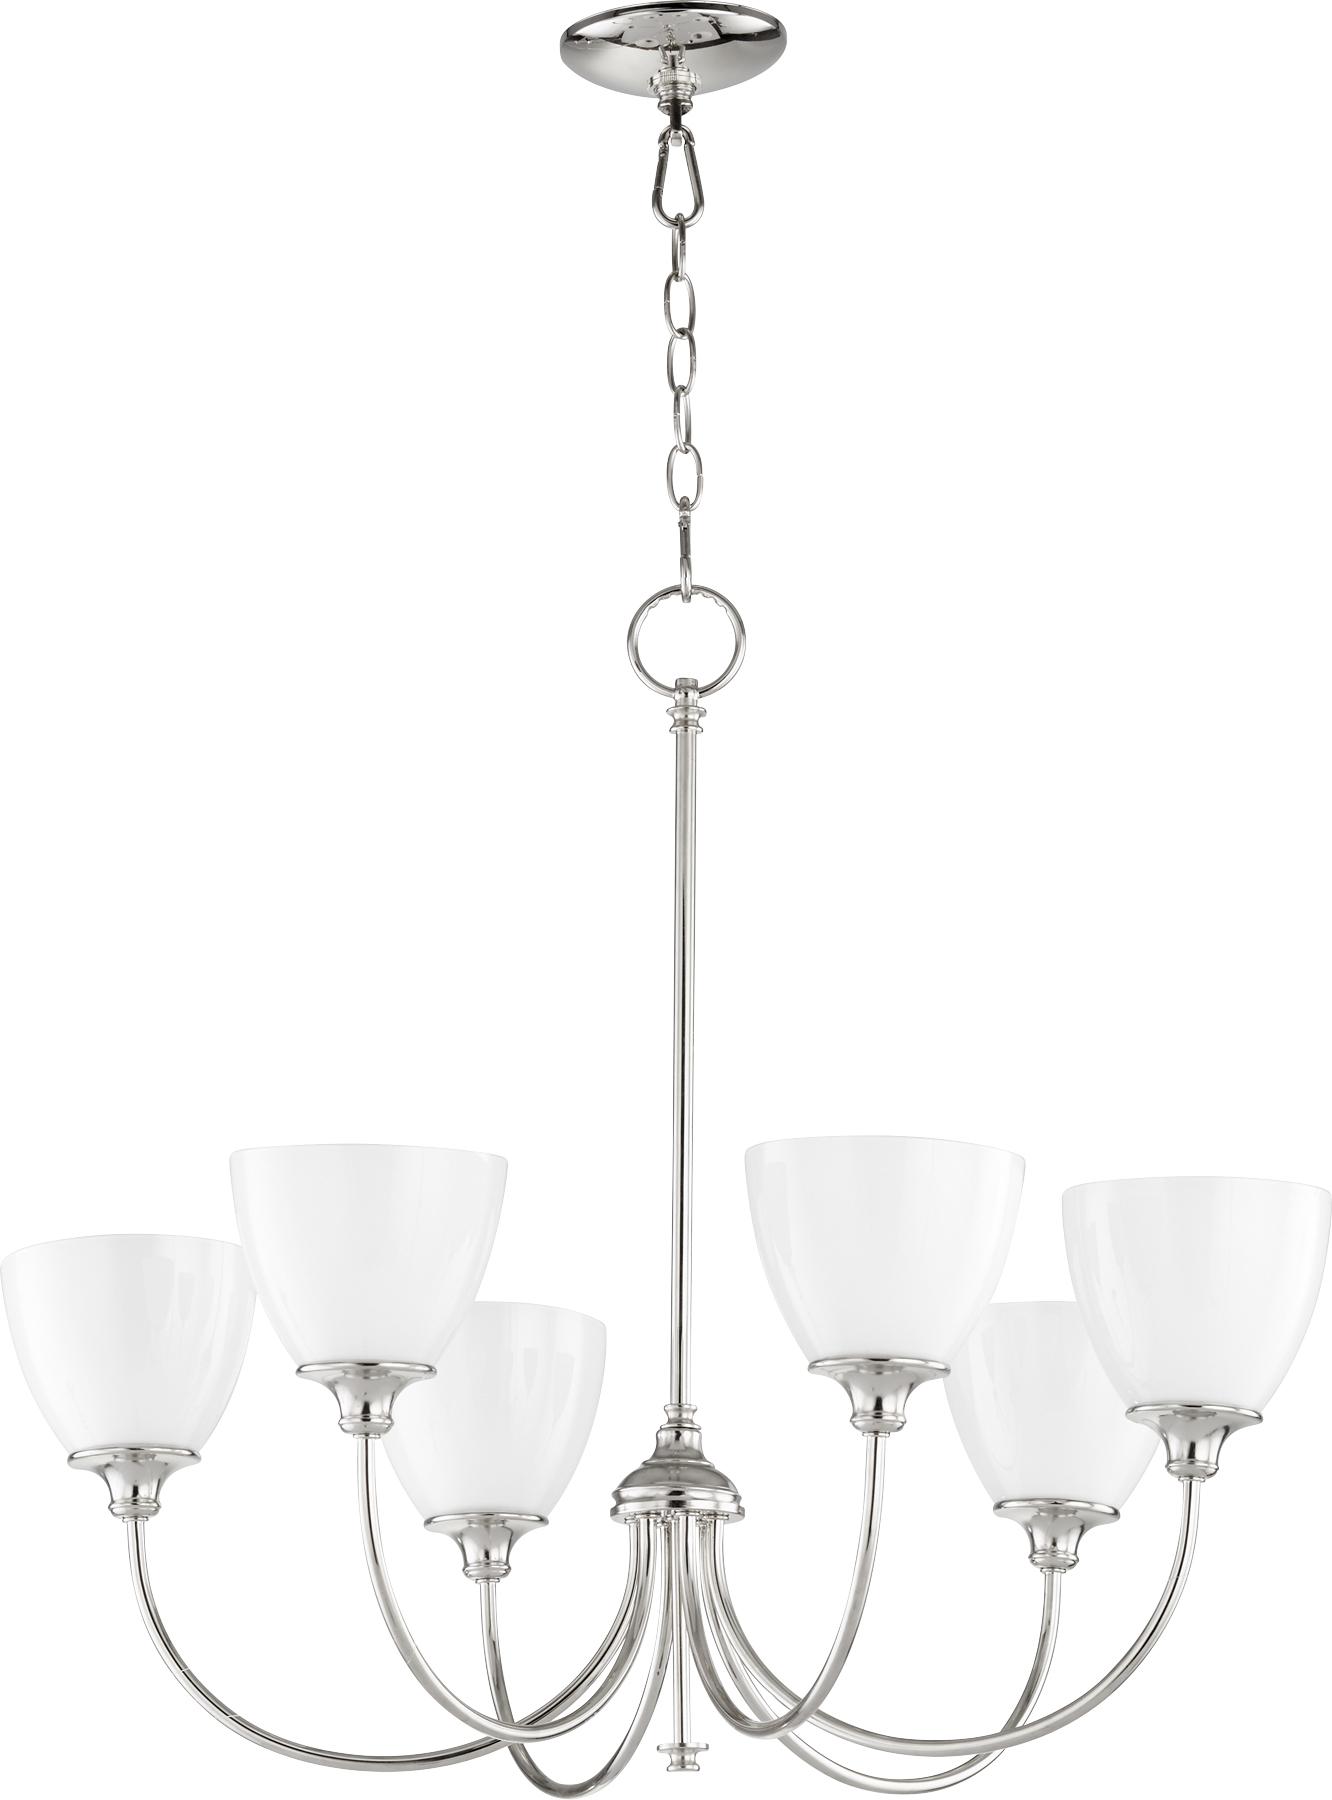 Polished Nickel Celeste 6 Light 28 Wide Chandelier W White Opal Glass Shades